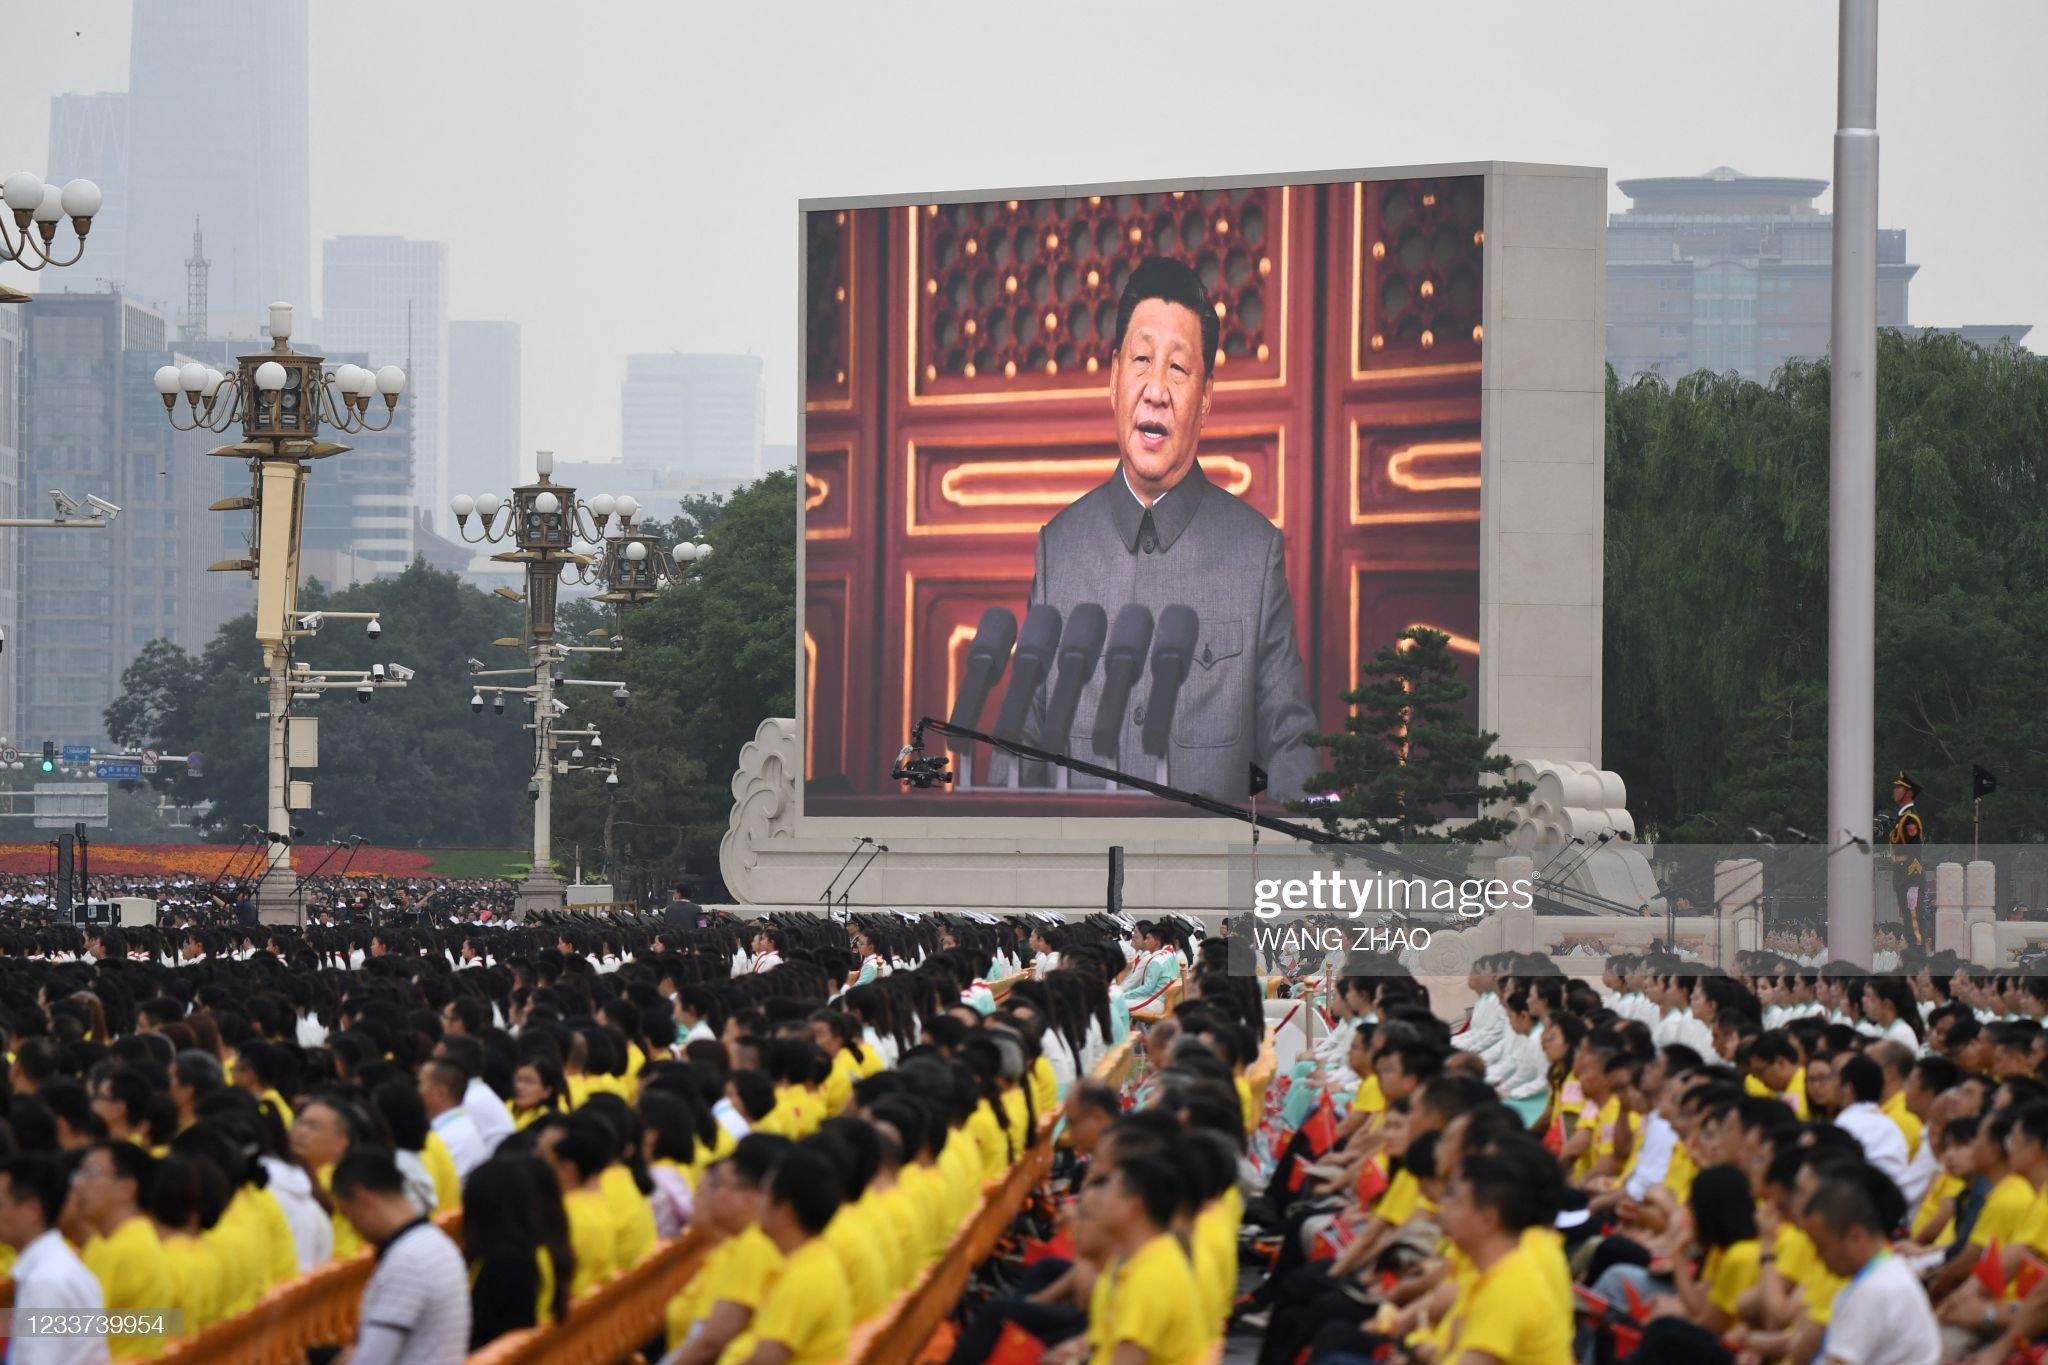 TOPSHOT-CHINA-POLITICS-PARTY-ANNIVERSARY : News Photo